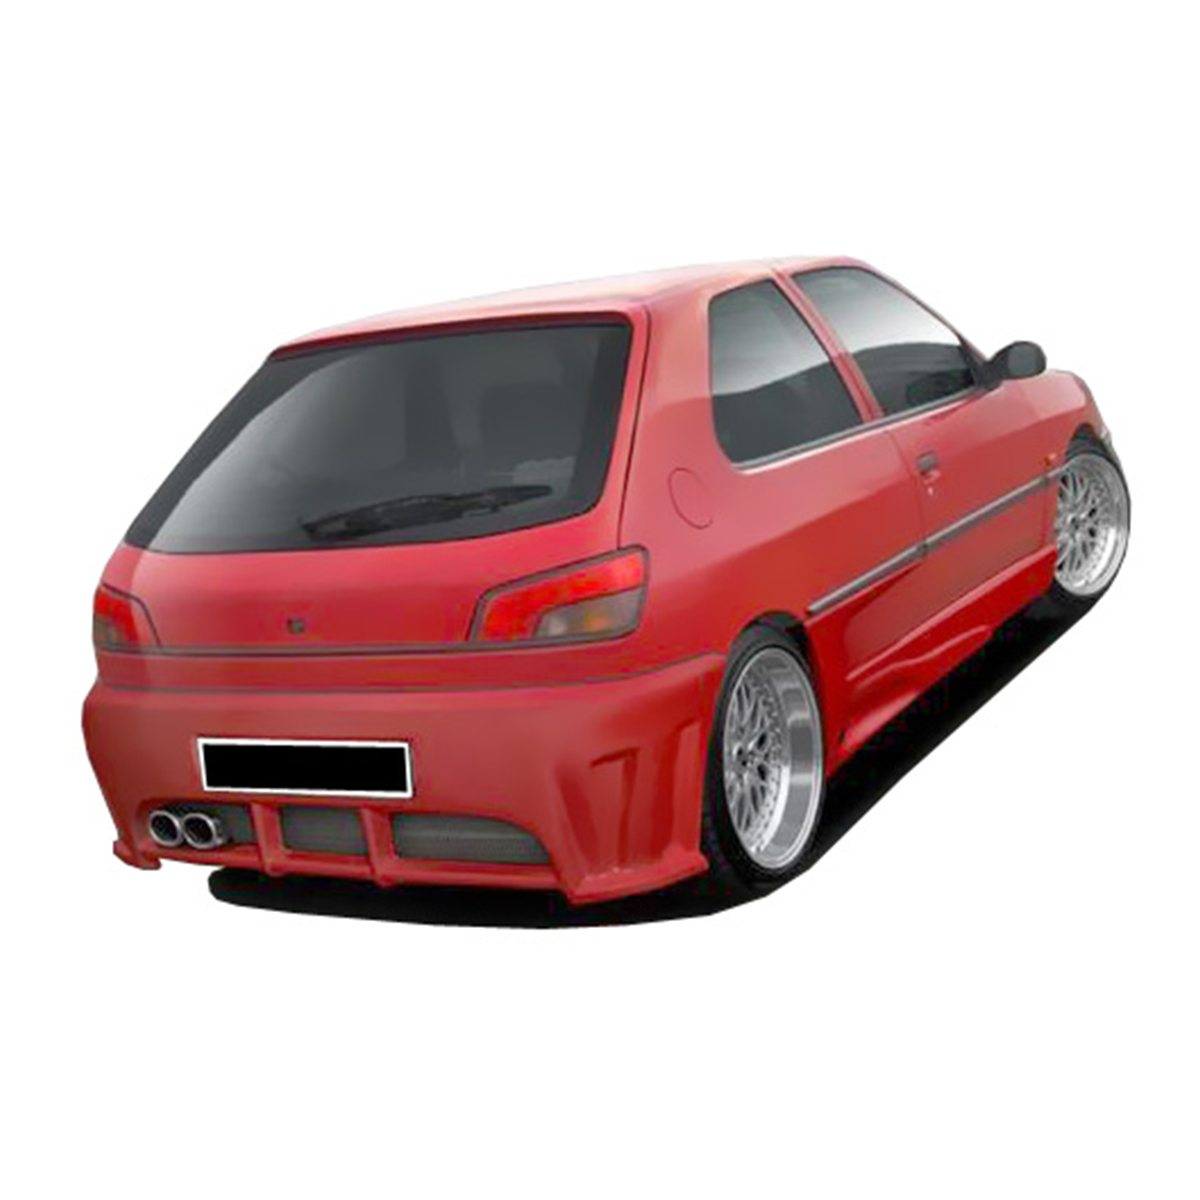 Peugeot-306-Invasion-Tras-PCS149